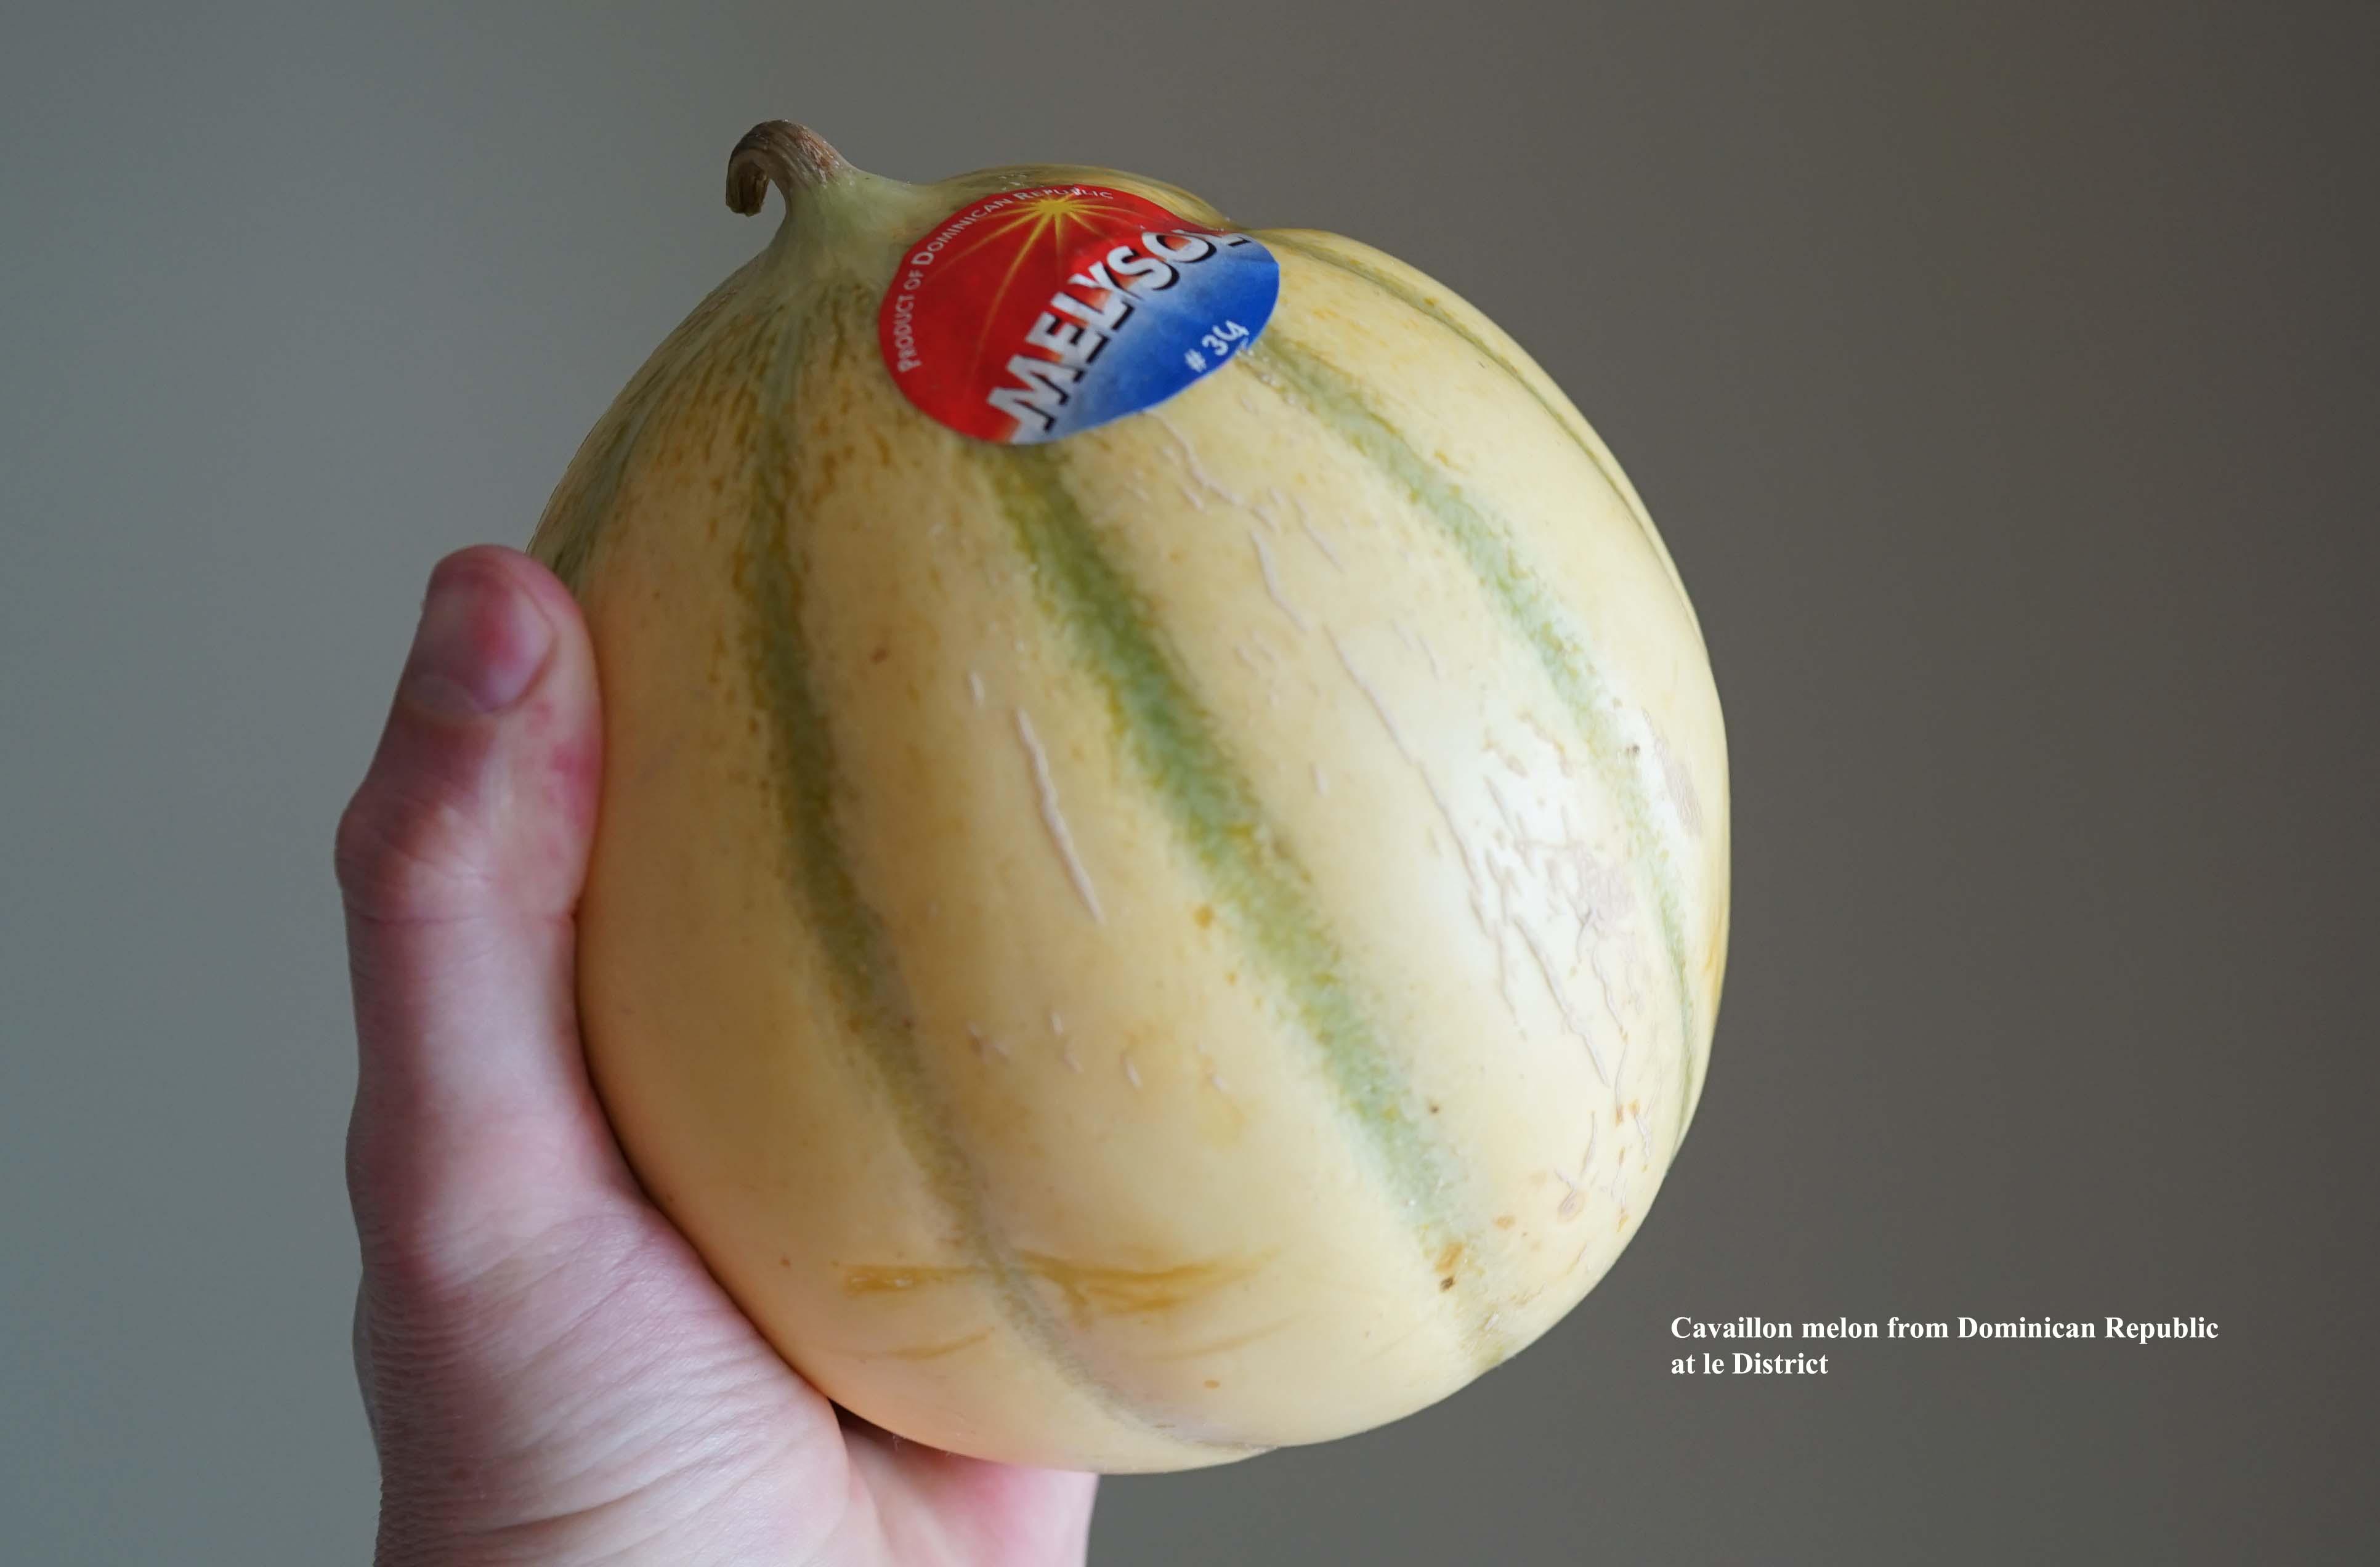 Cavaillon melon Le District